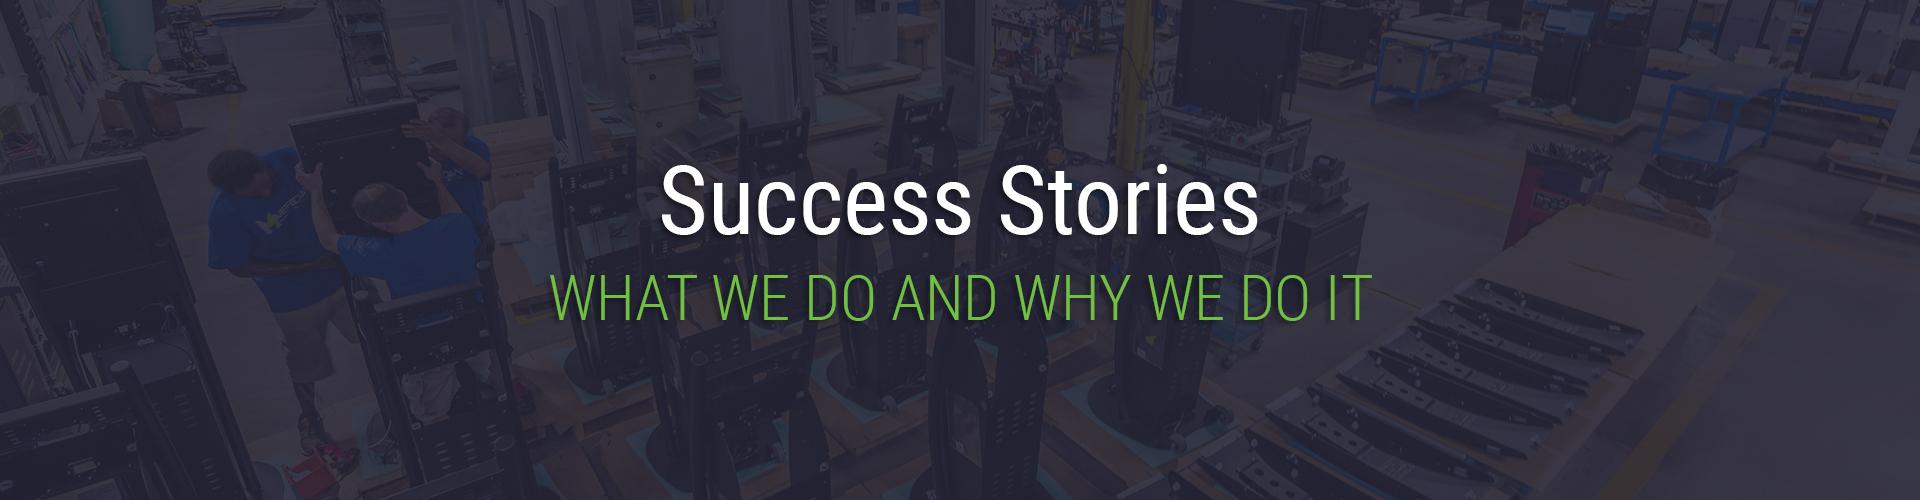 Success Stories Header